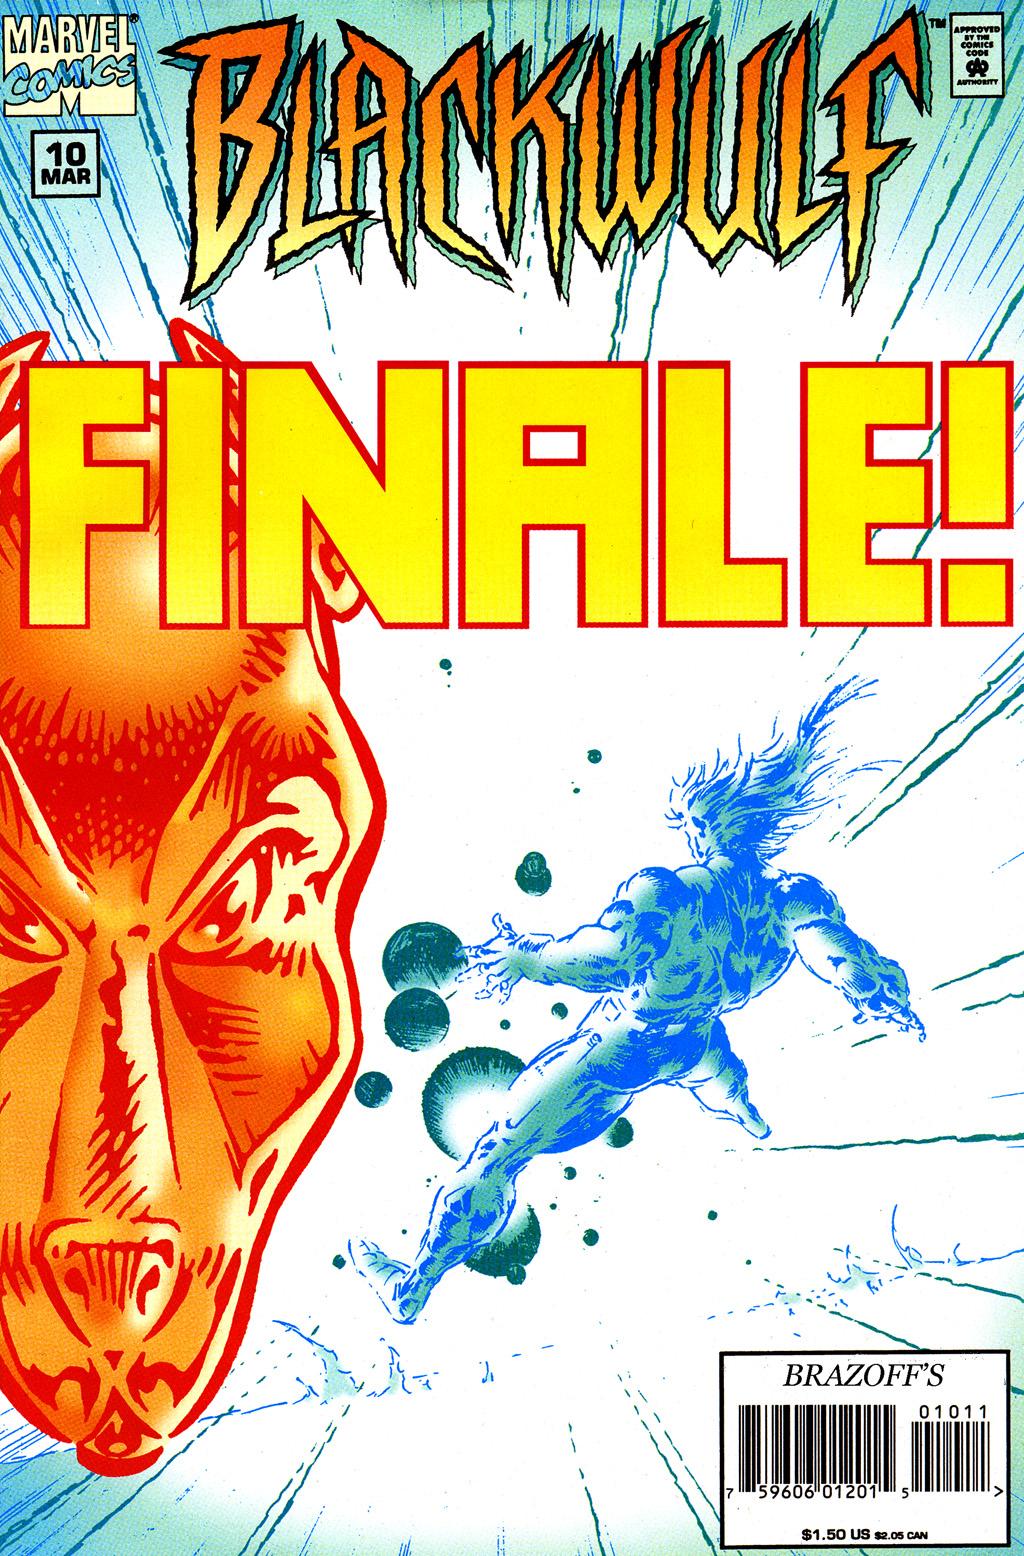 Read online Blackwulf comic -  Issue #10 - 1